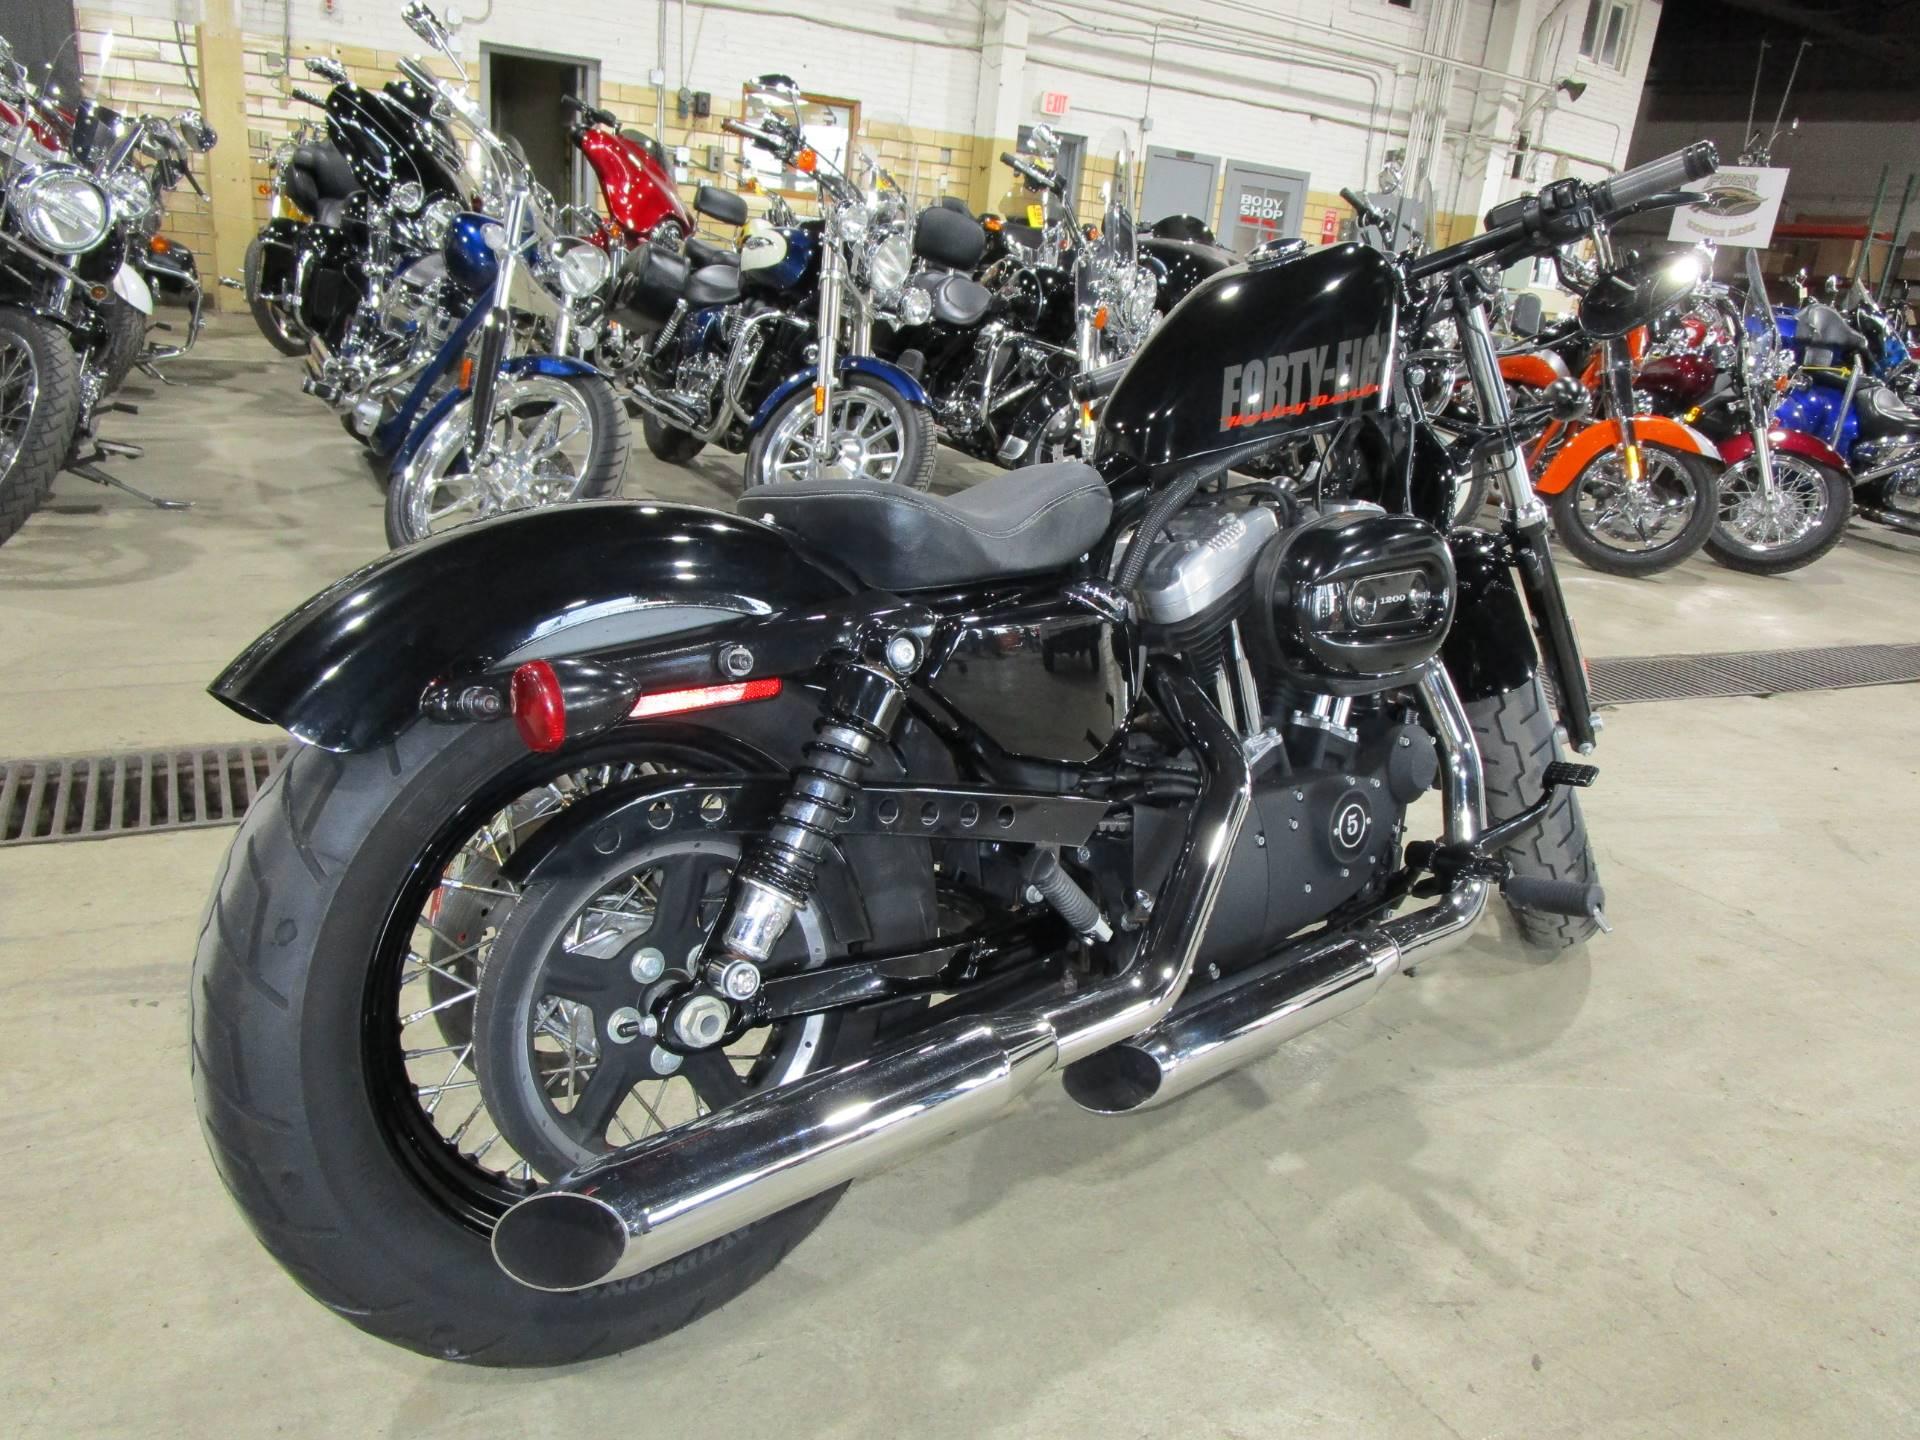 2013 Harley-Davidson Sportster Forty-Eight 4